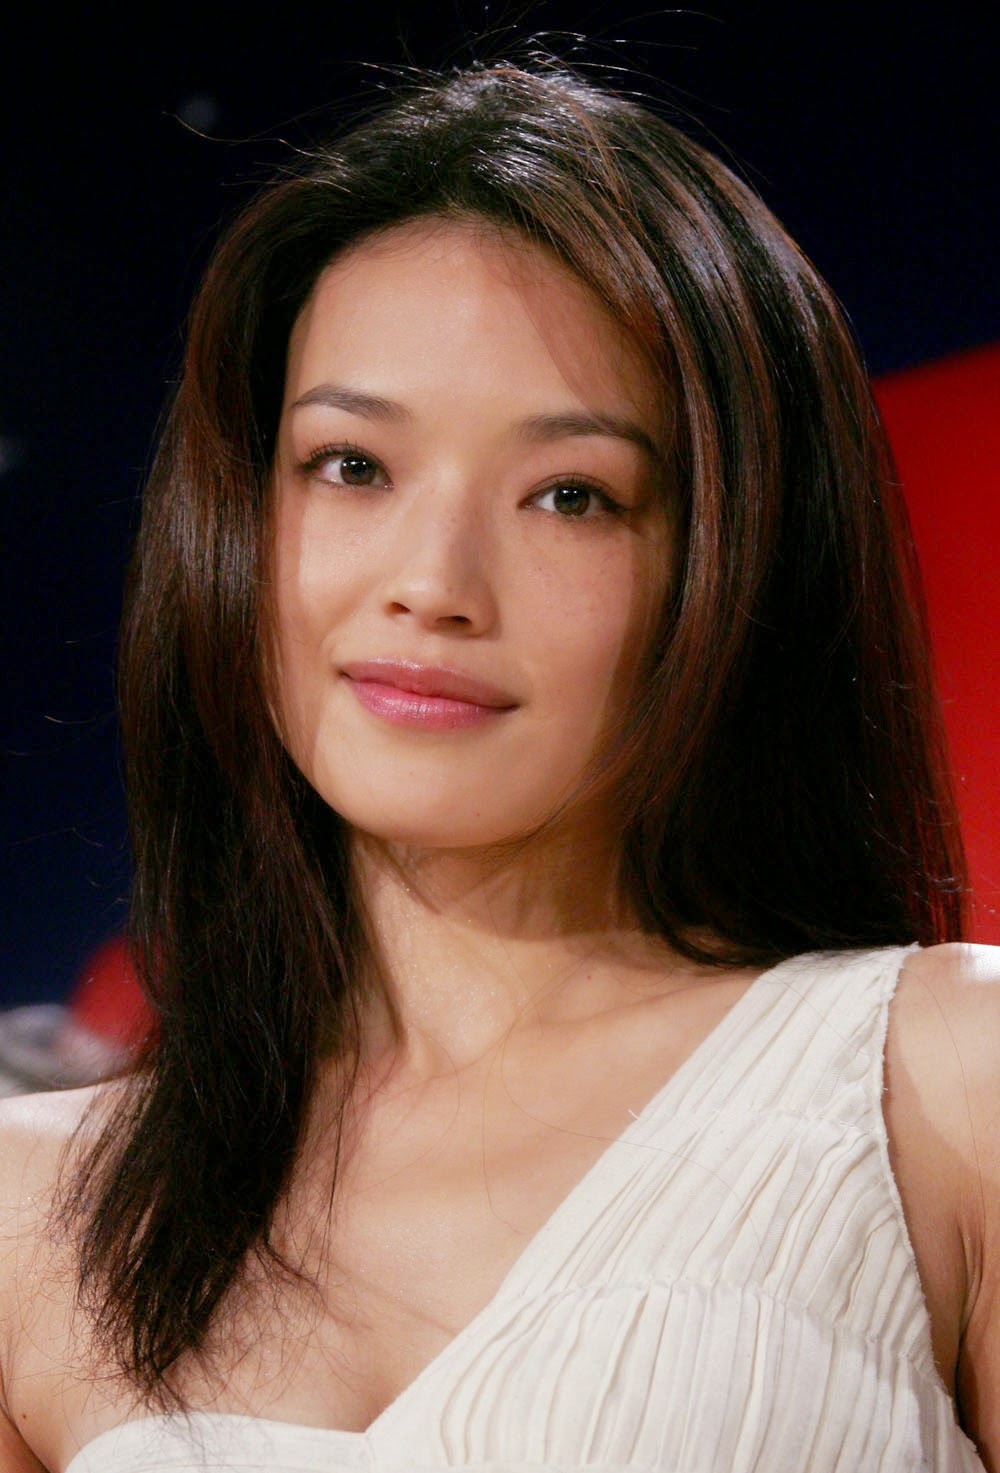 Shu Qi photo 35 of 86 pics, wallpaper - photo #54125